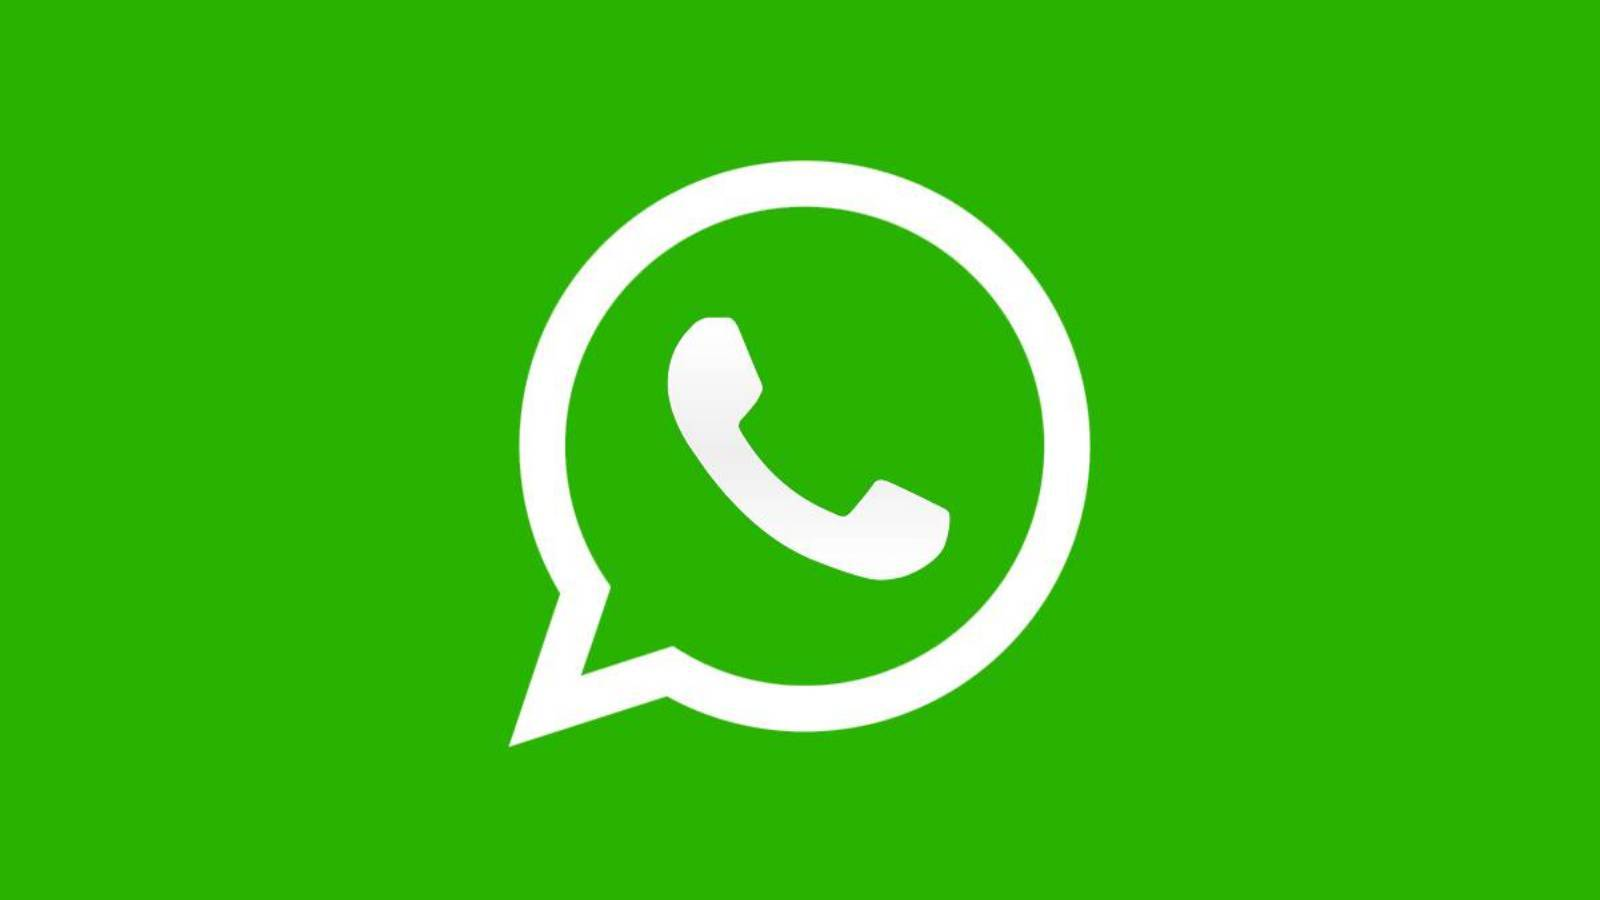 WhatsApp plata